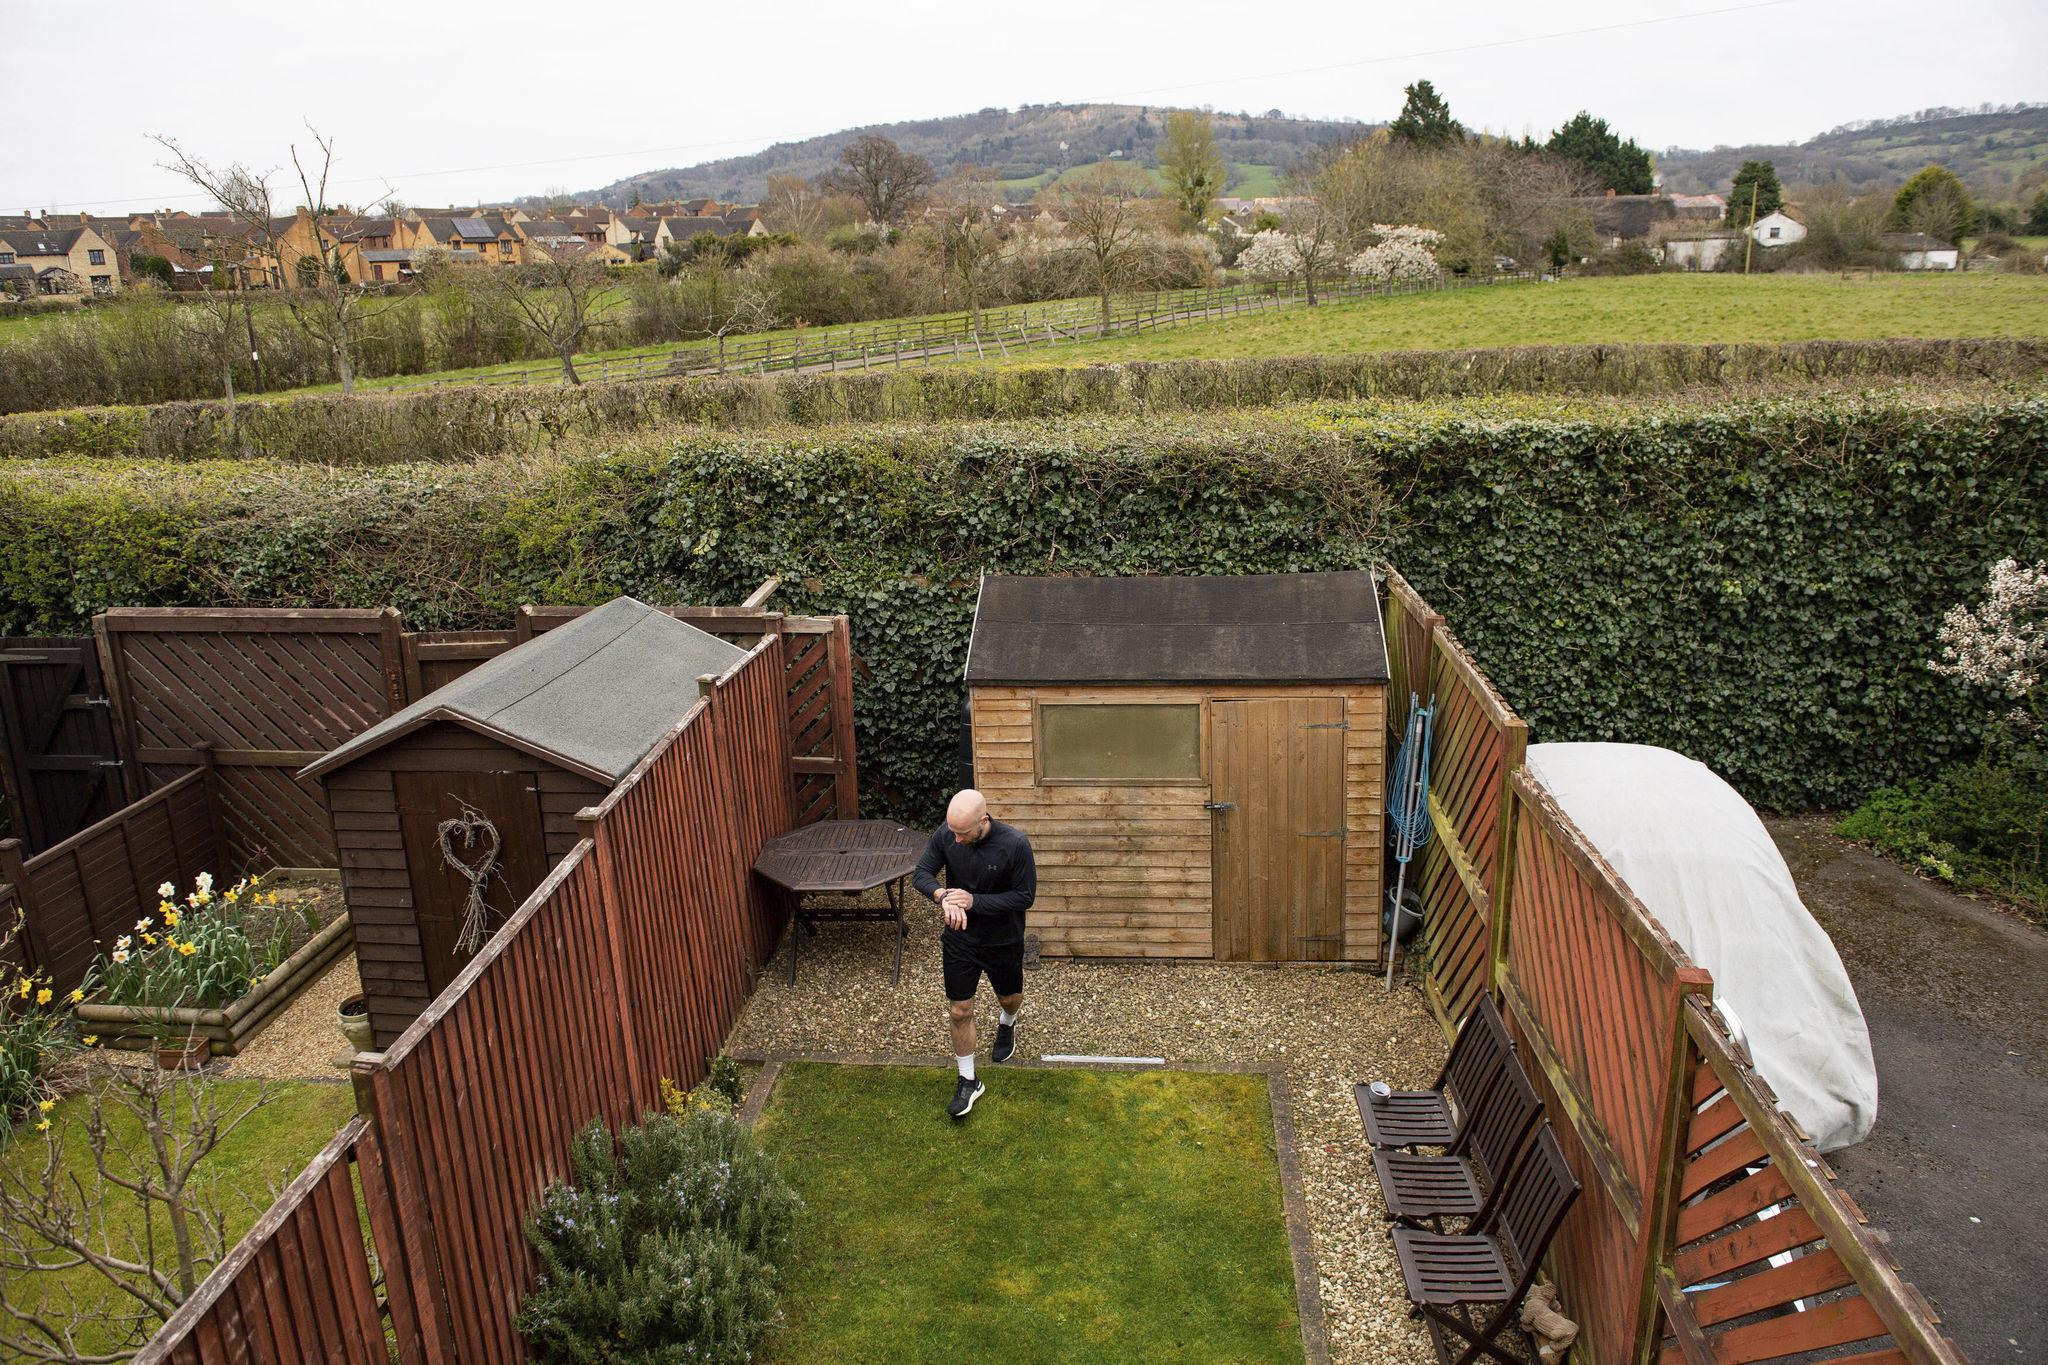 U.K. man raised $33,500 for charity running a marathon in his 20-foot backyard, during coronavirus lockdown